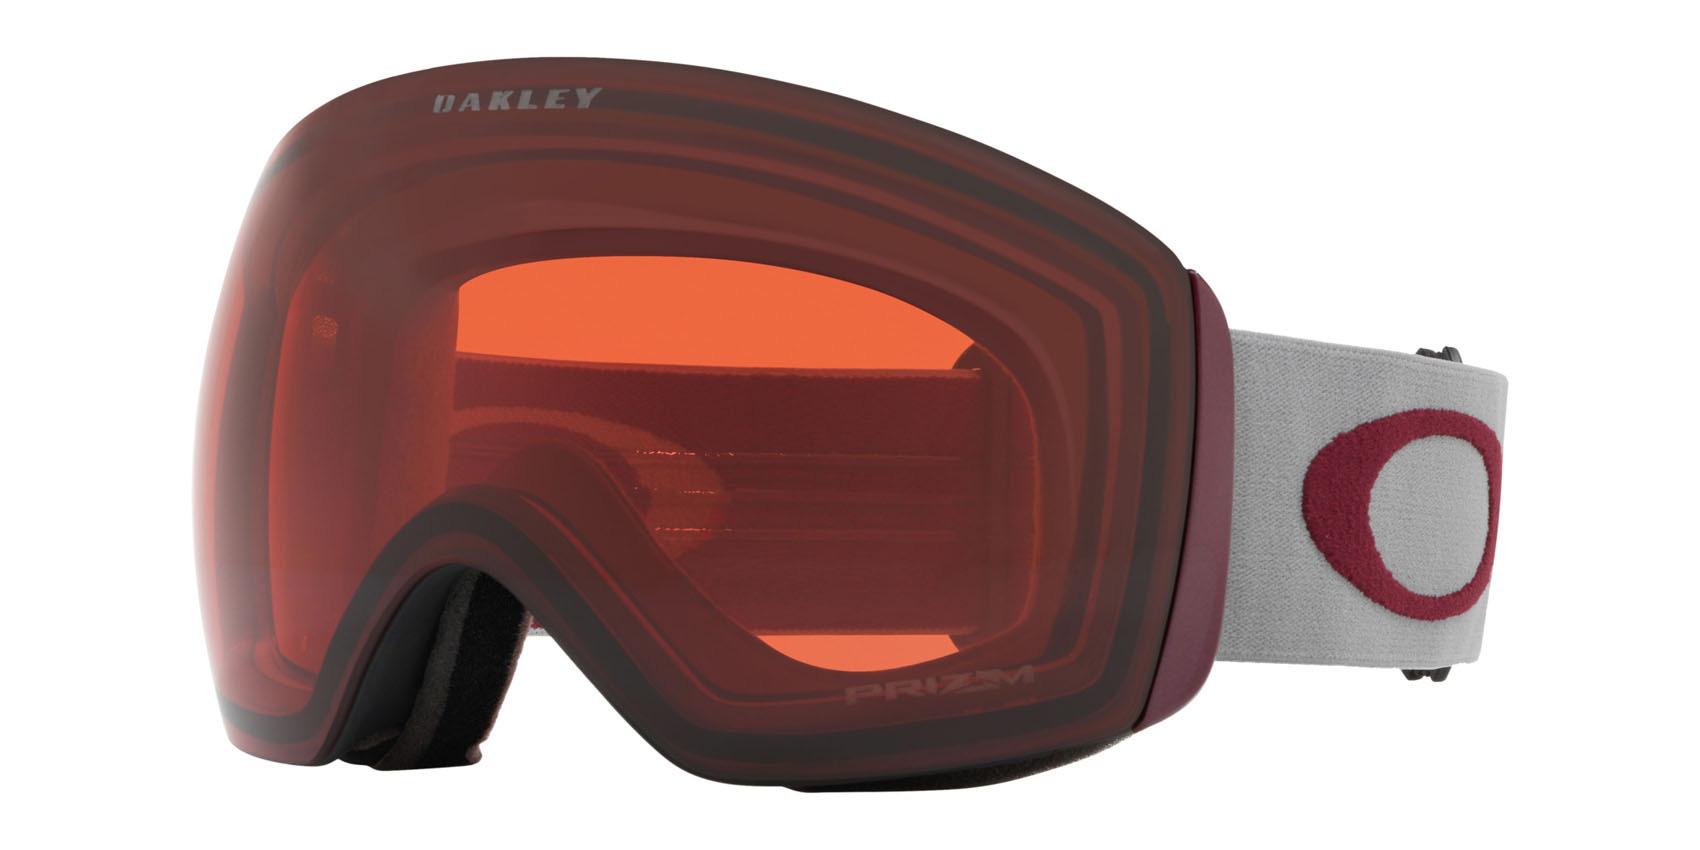 b83fc03d77 Oakley Flight Deck Goggle 2019 Sharkskin Port Prizm Rose